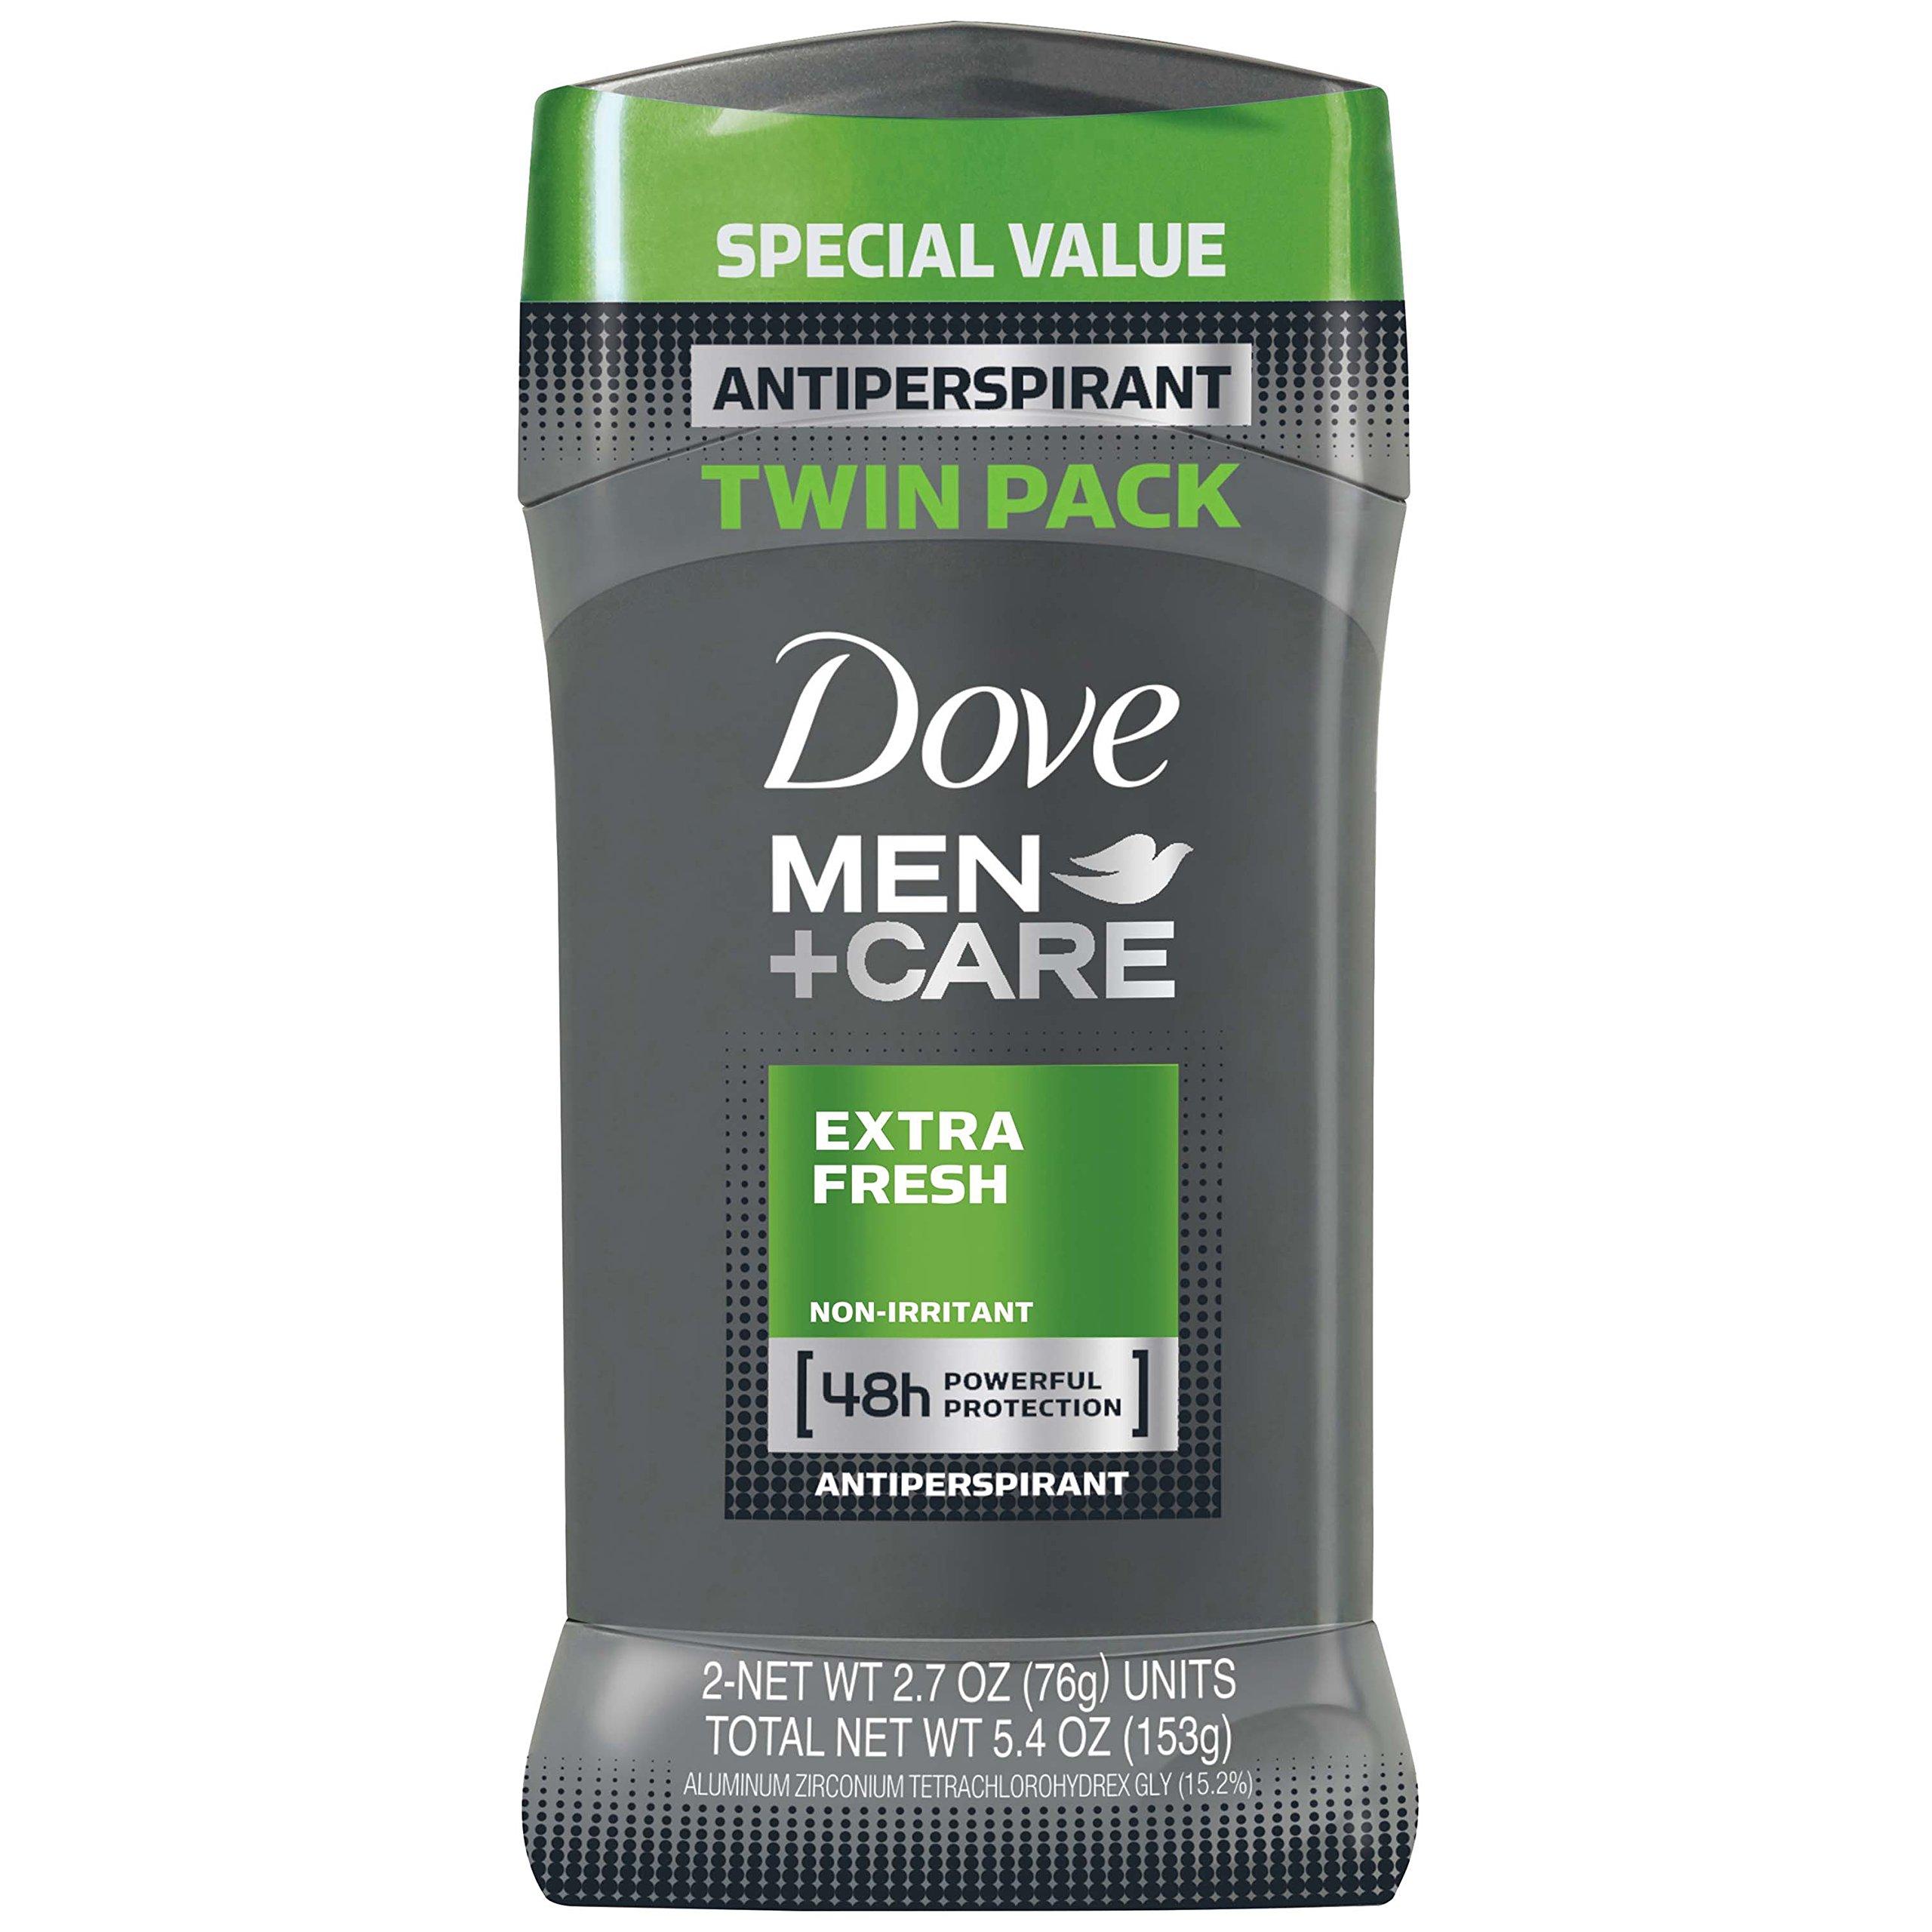 Dove Men+Care Antiperspirant Deodorant Stick, Extra Fresh, 2.7 oz (Pack of 2)